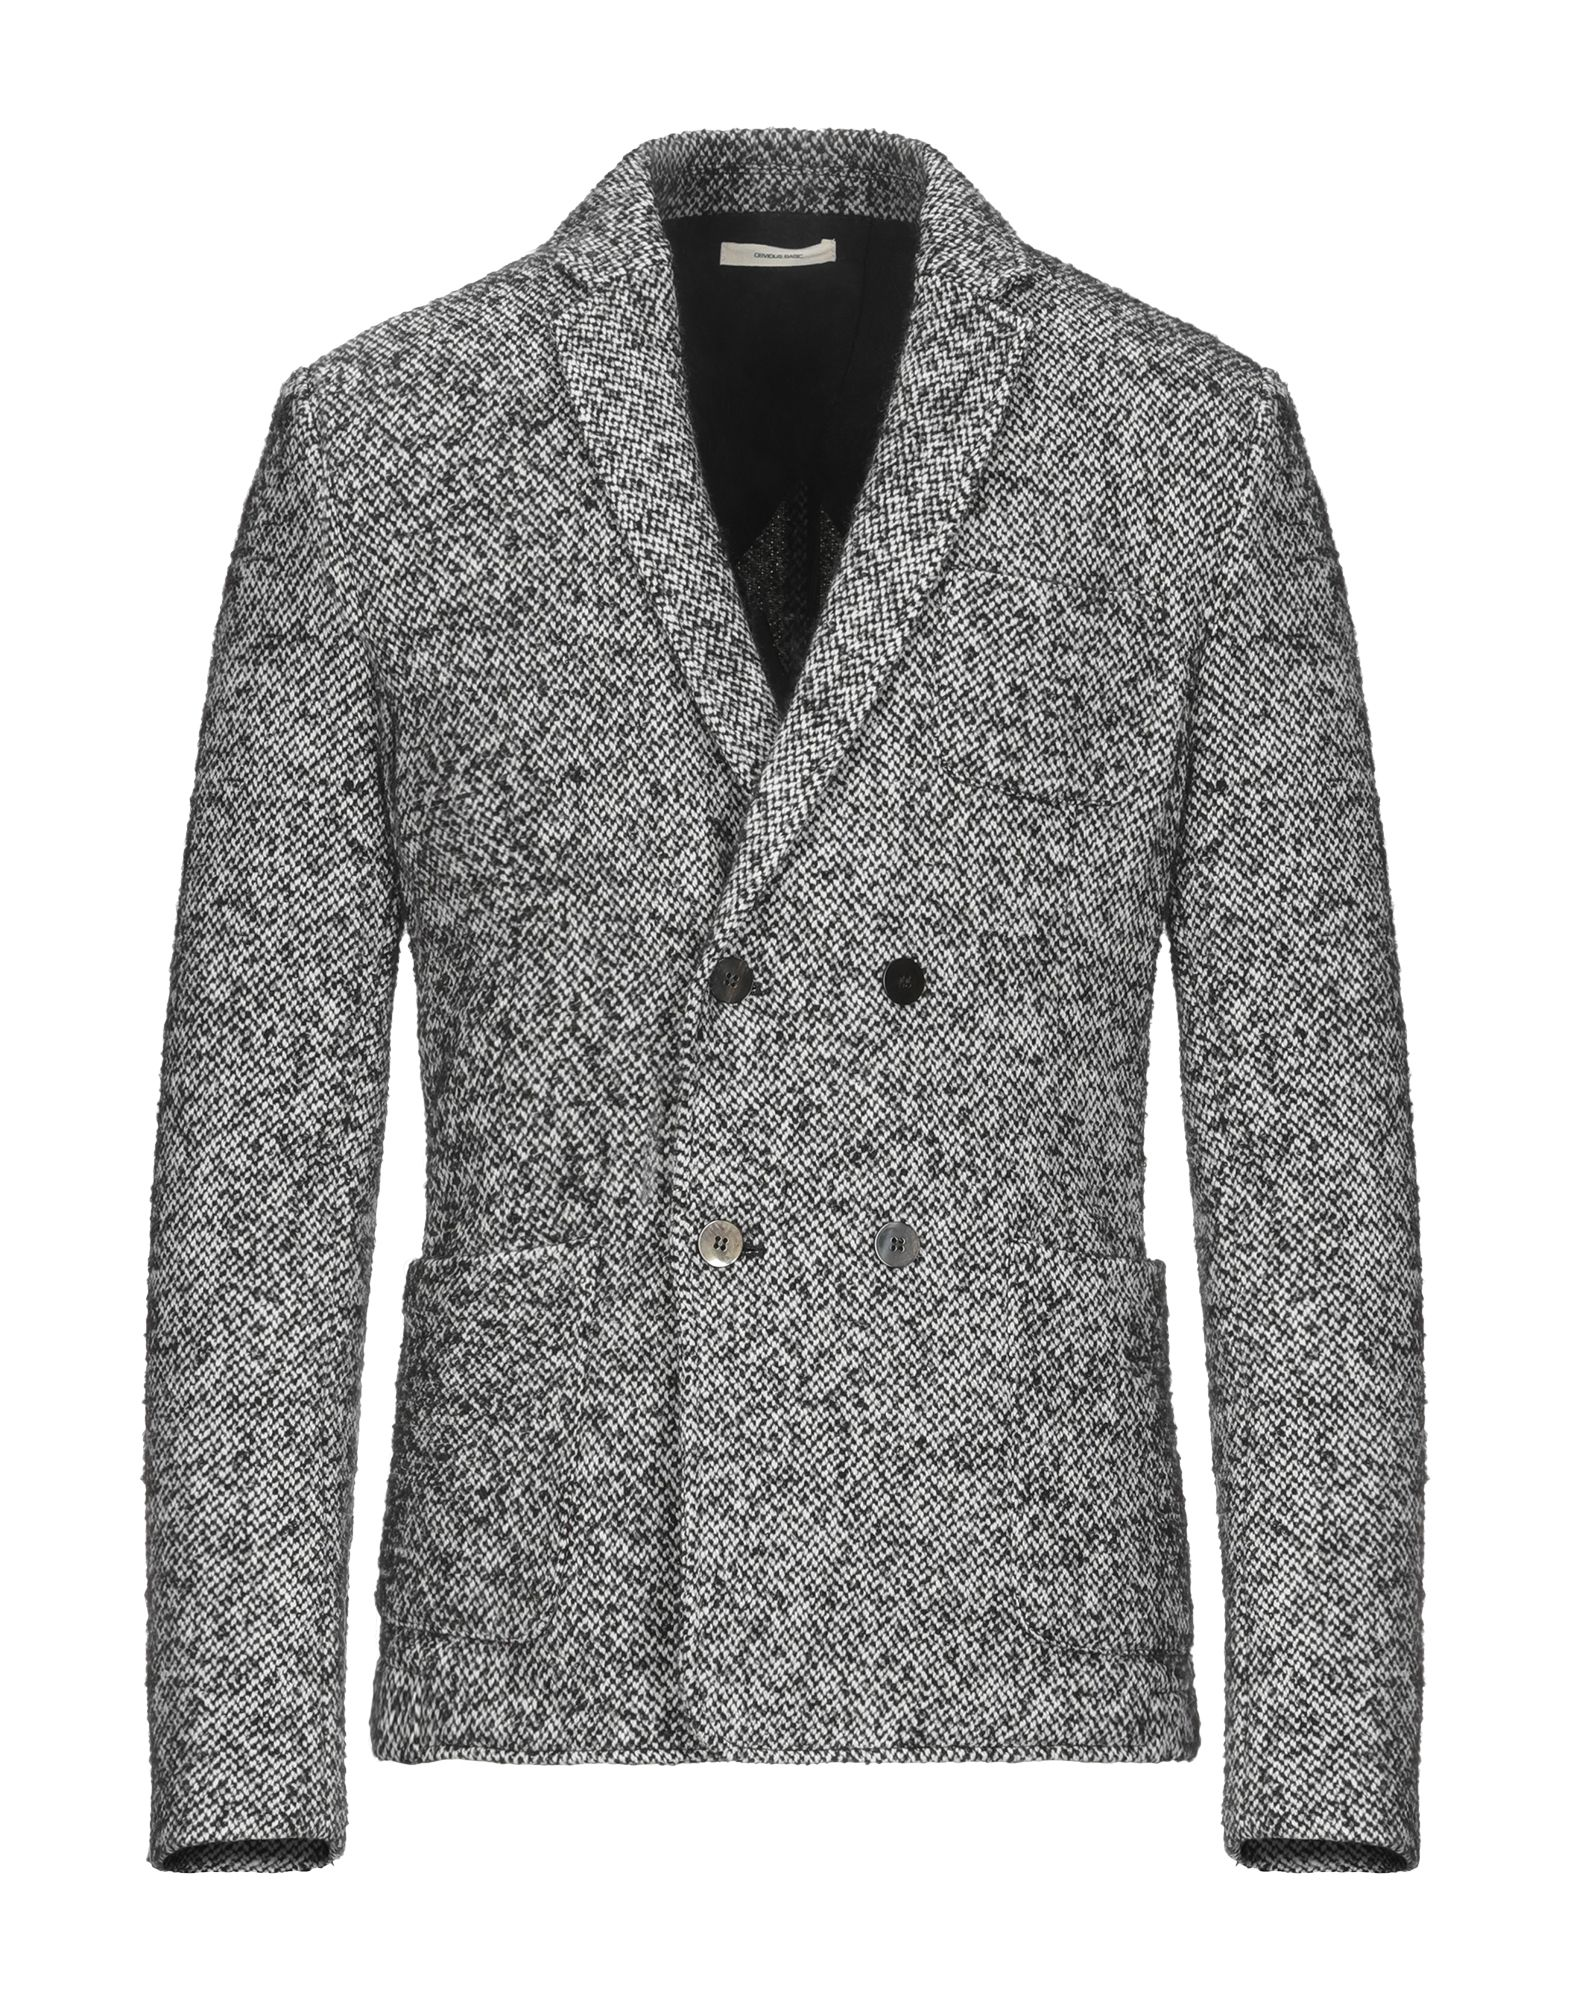 OBVIOUS BASIC Пиджак костюм ширли gt basic